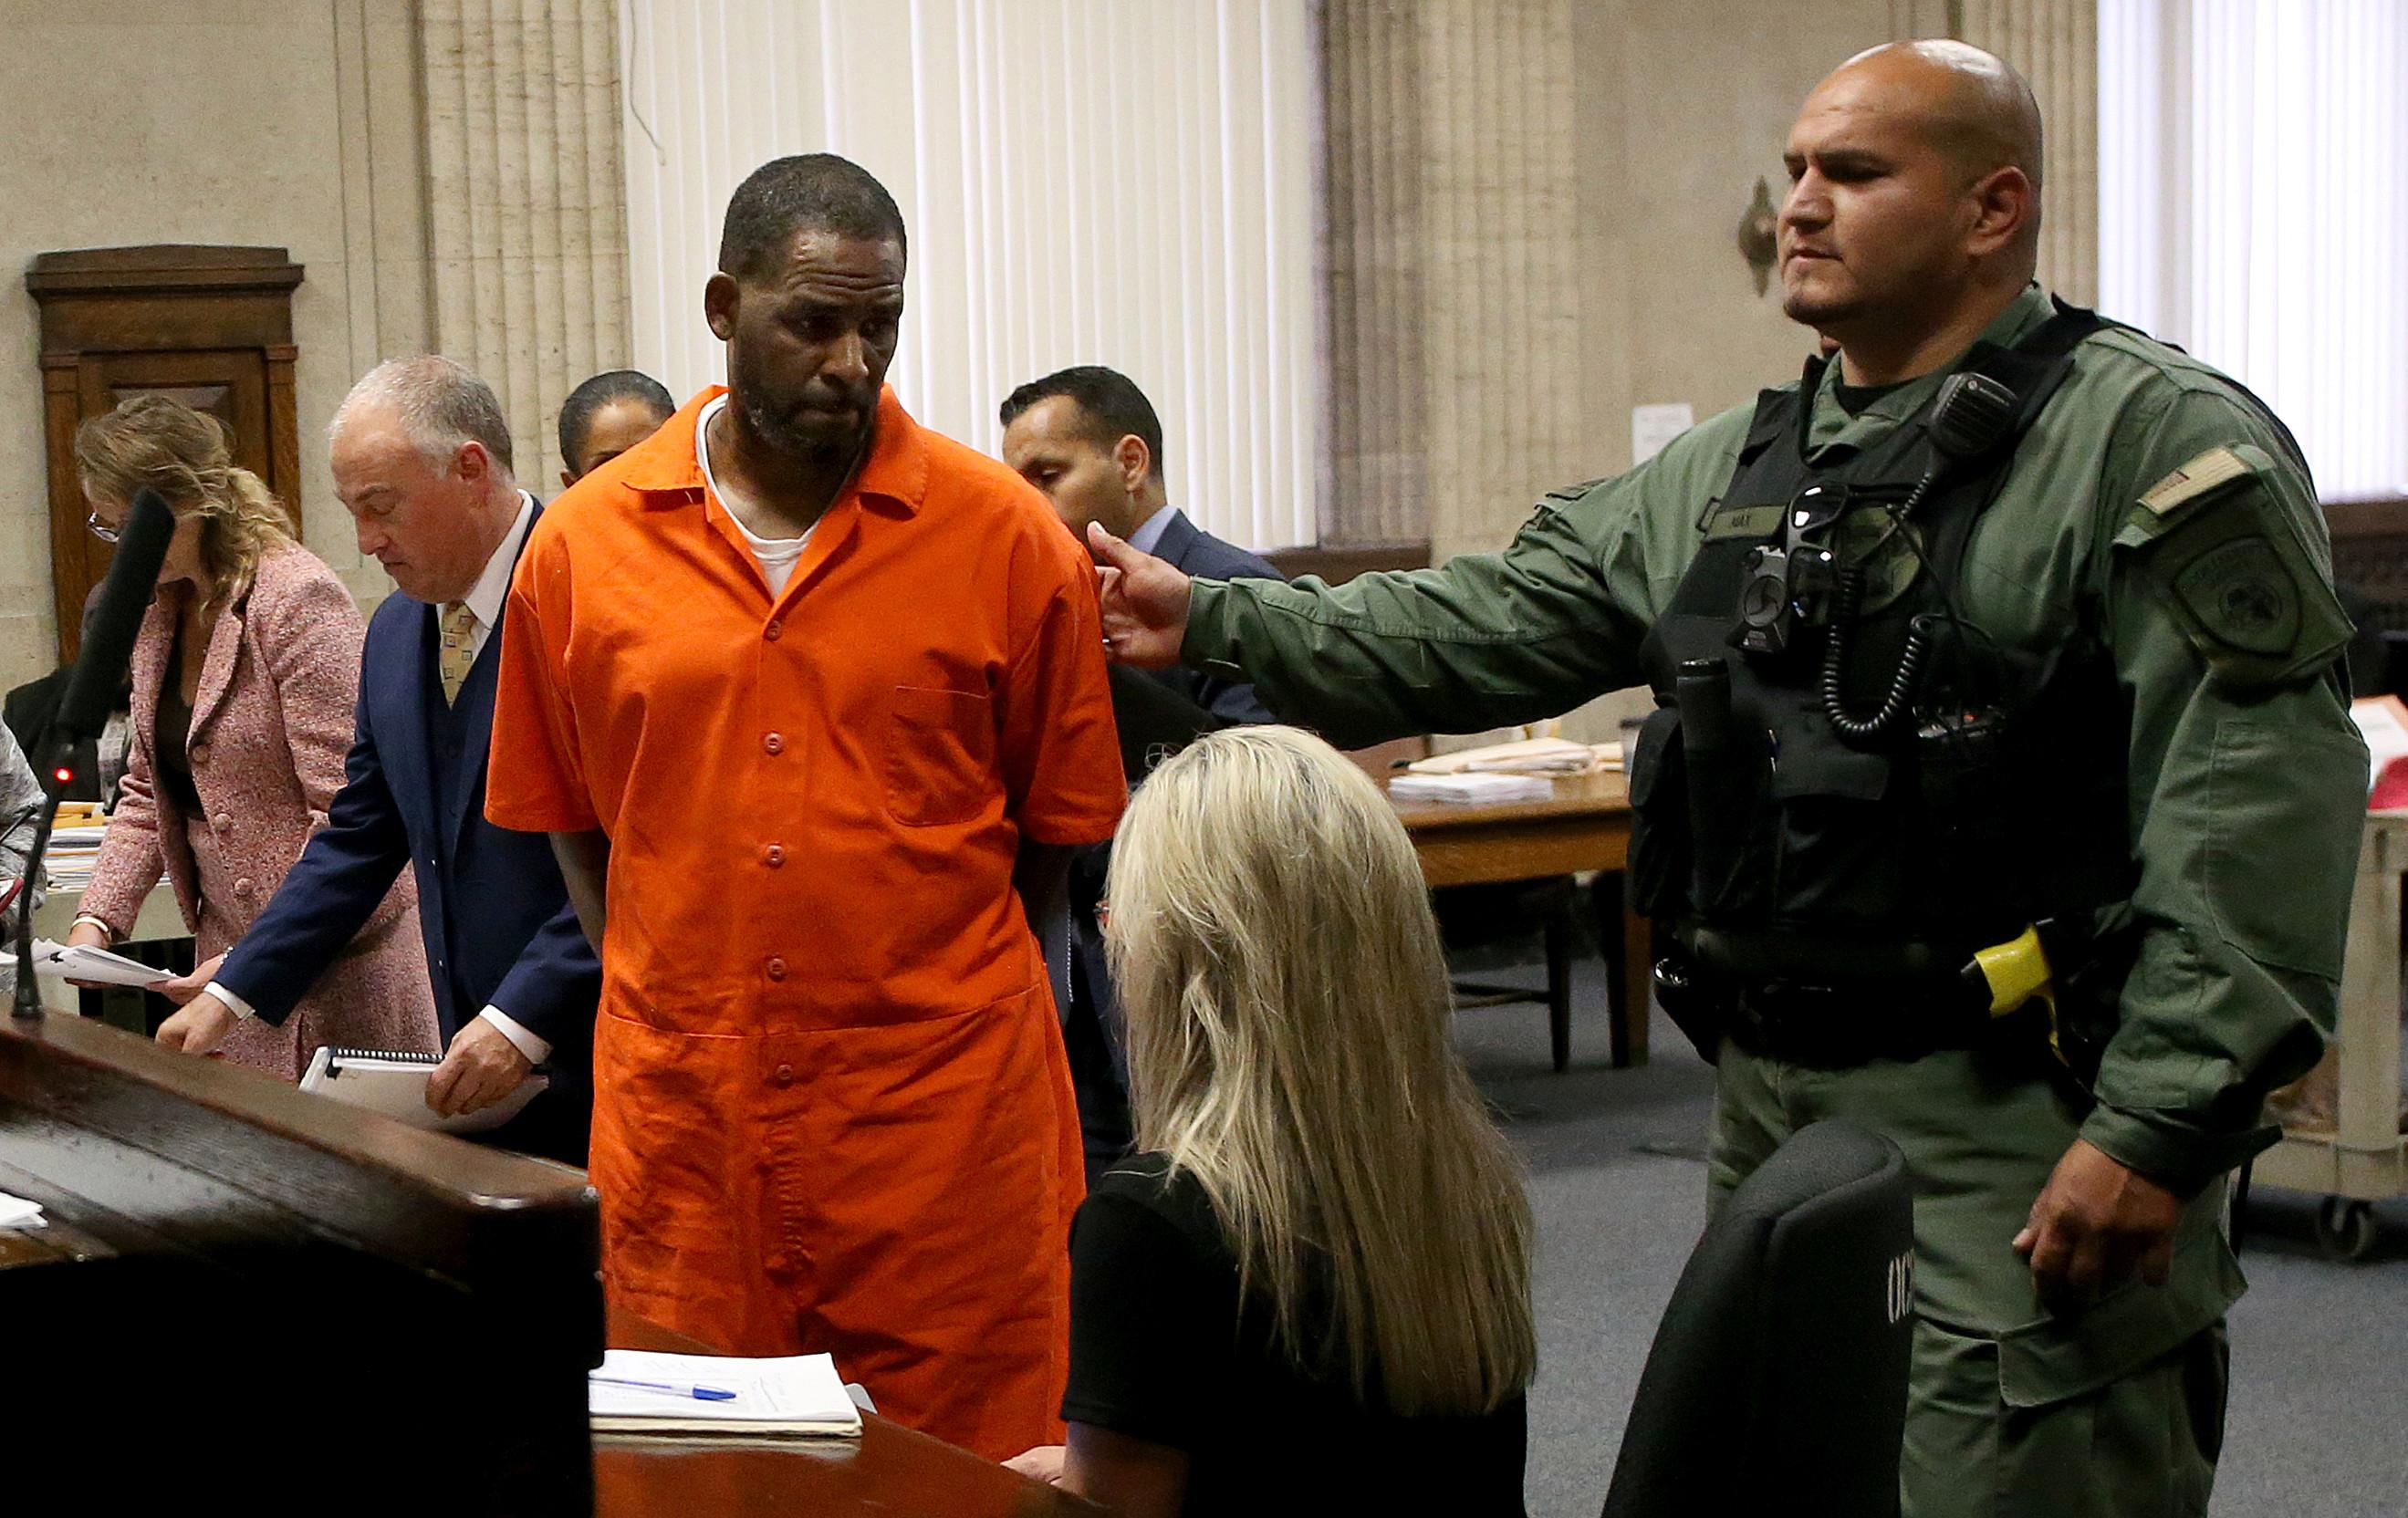 R Kelly seeking to exit federal custody due to coronavirus fears